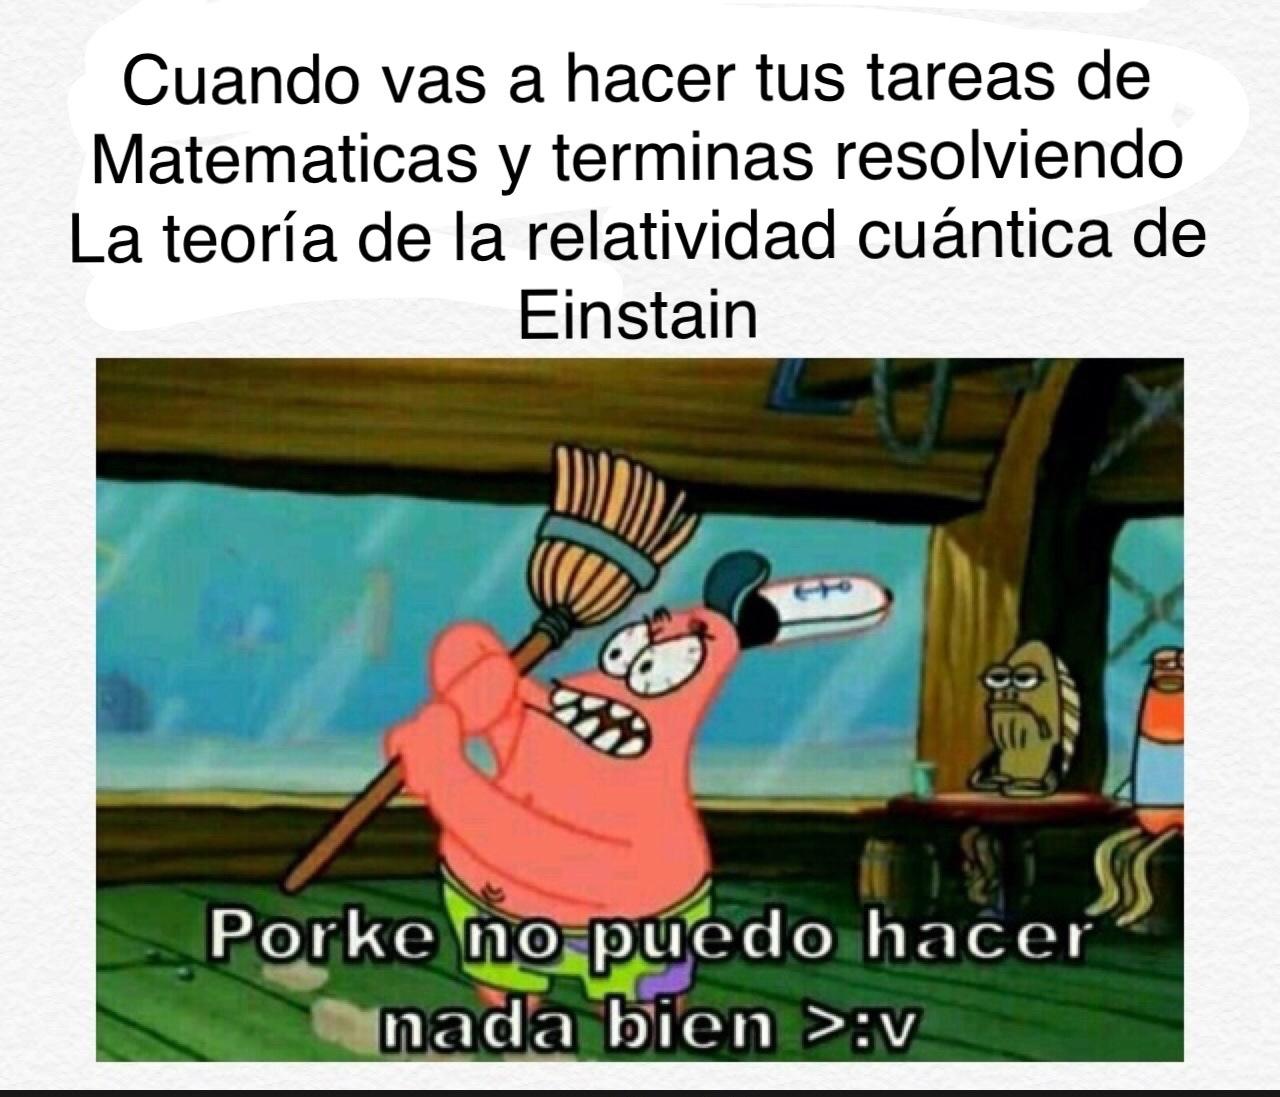 :'v me pasó ayer - meme